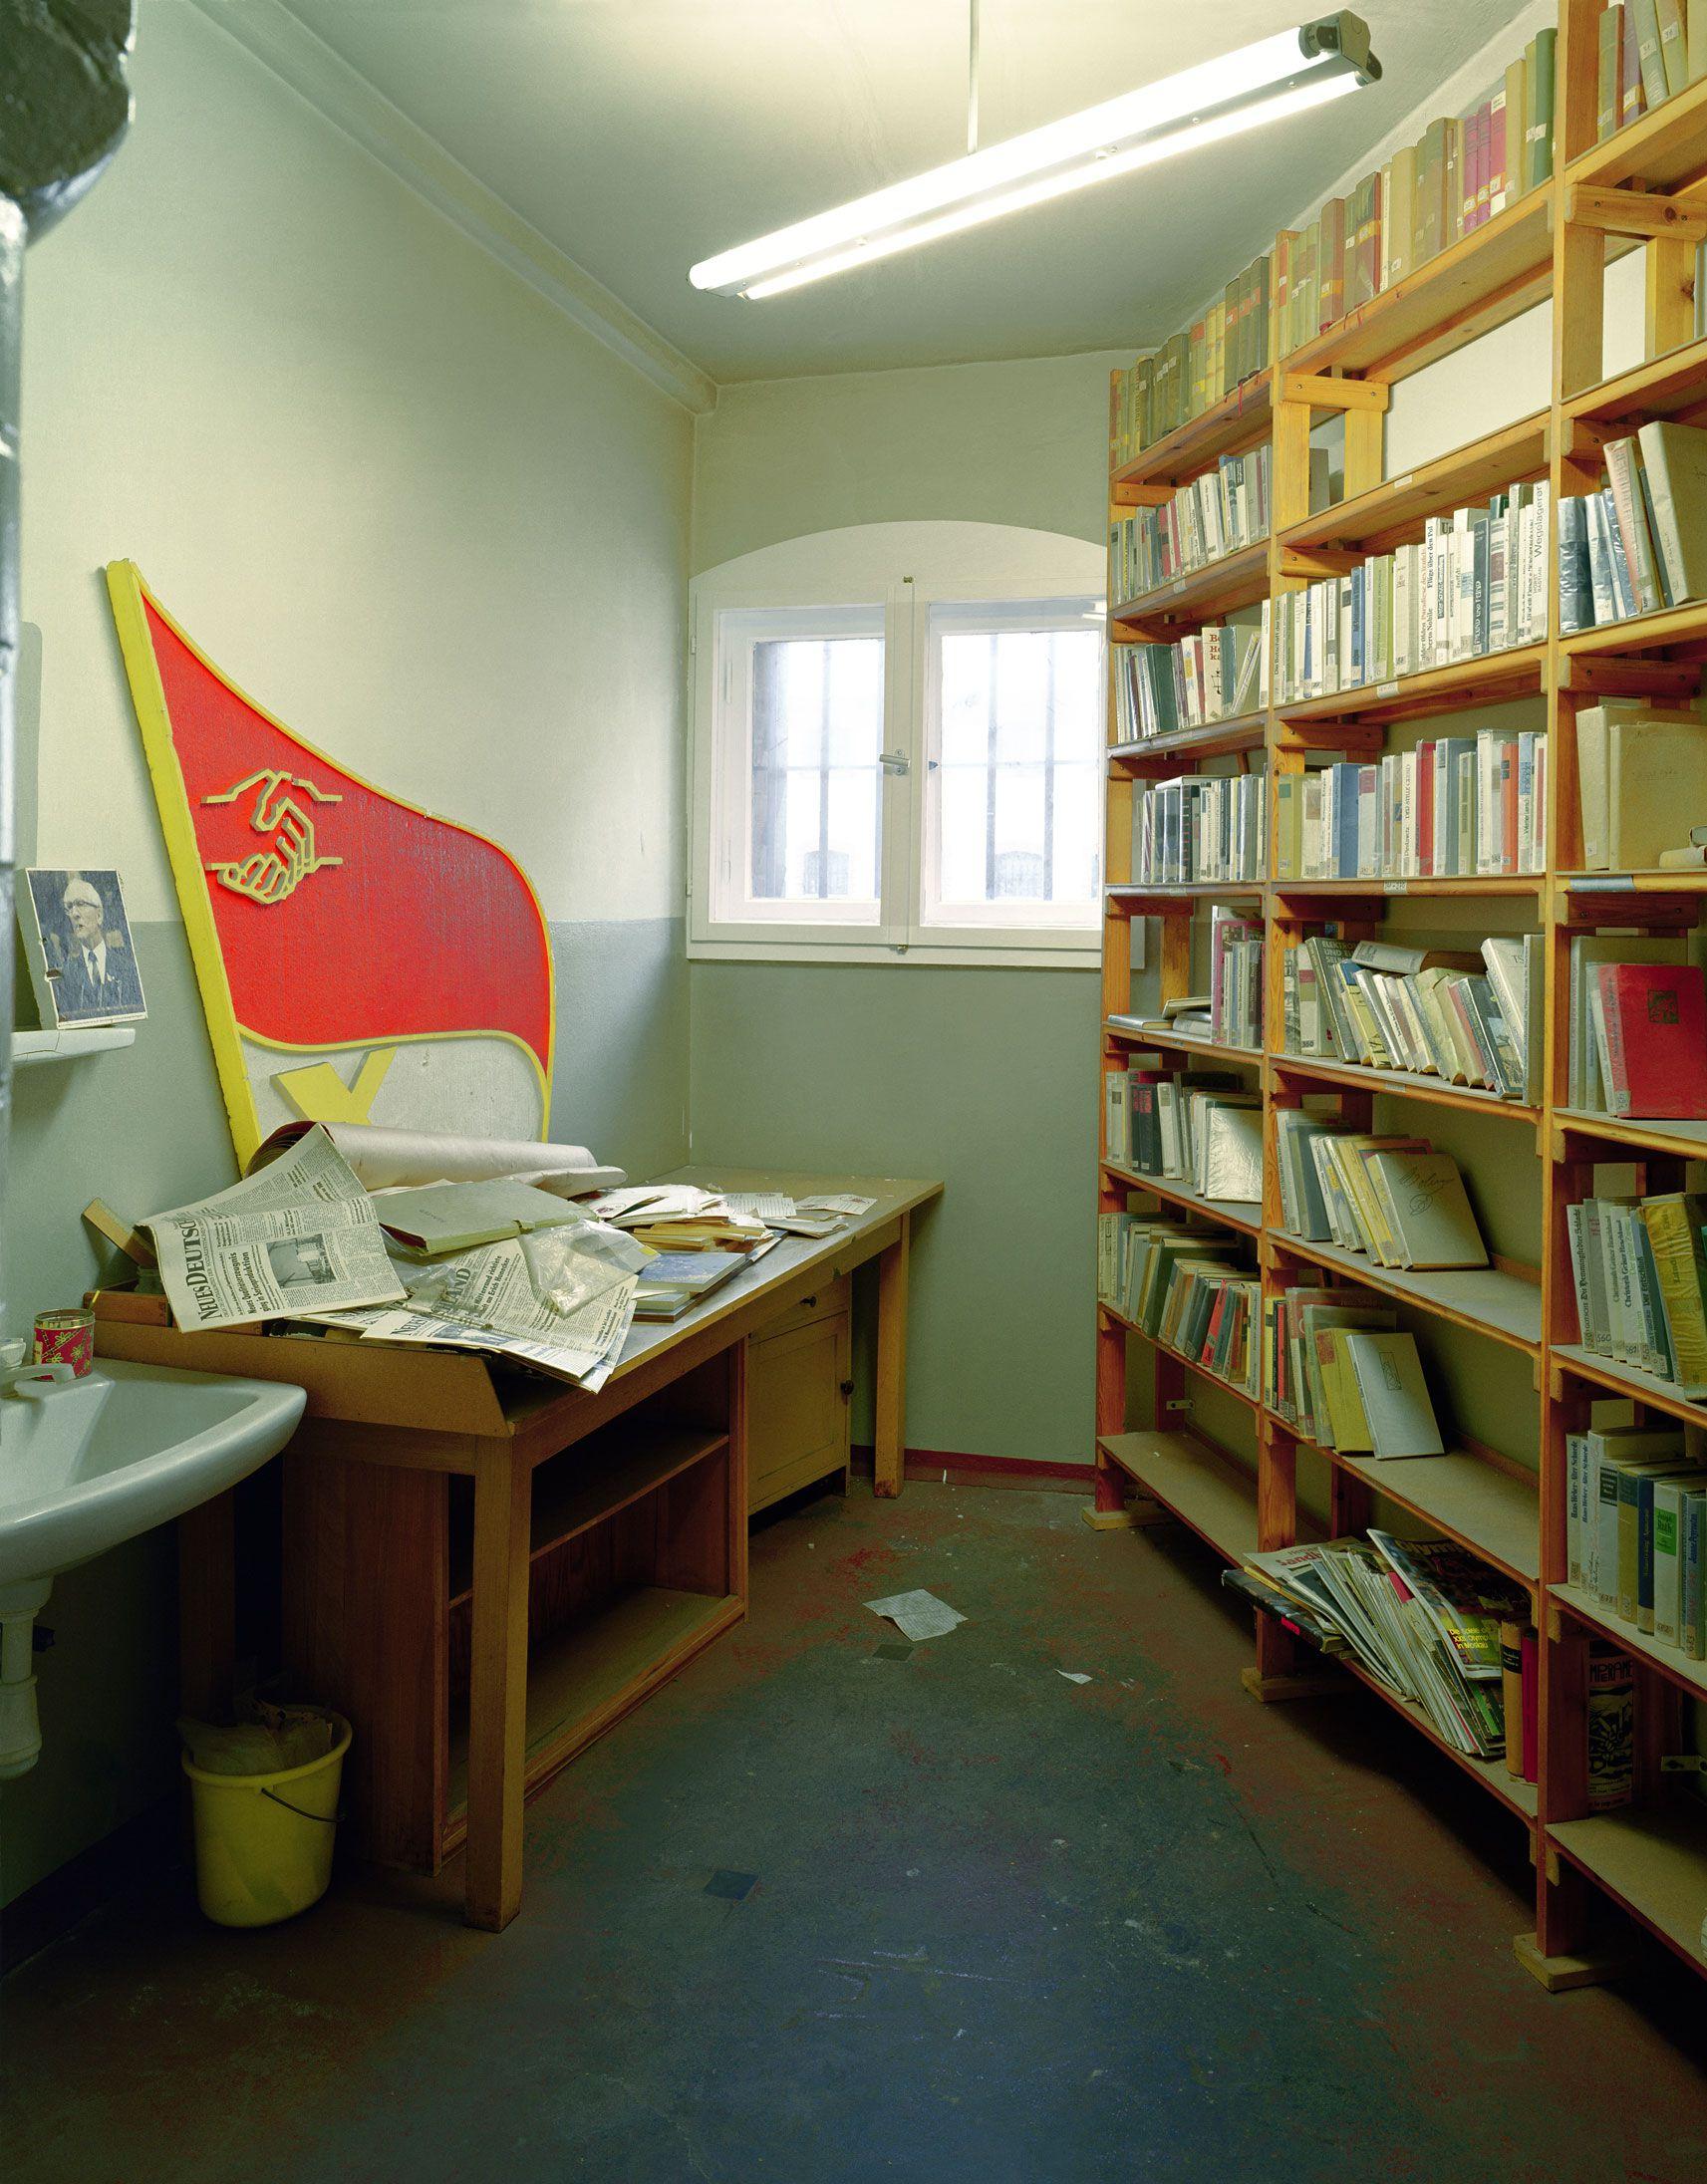 Library in a Stasi prison in Potsdam